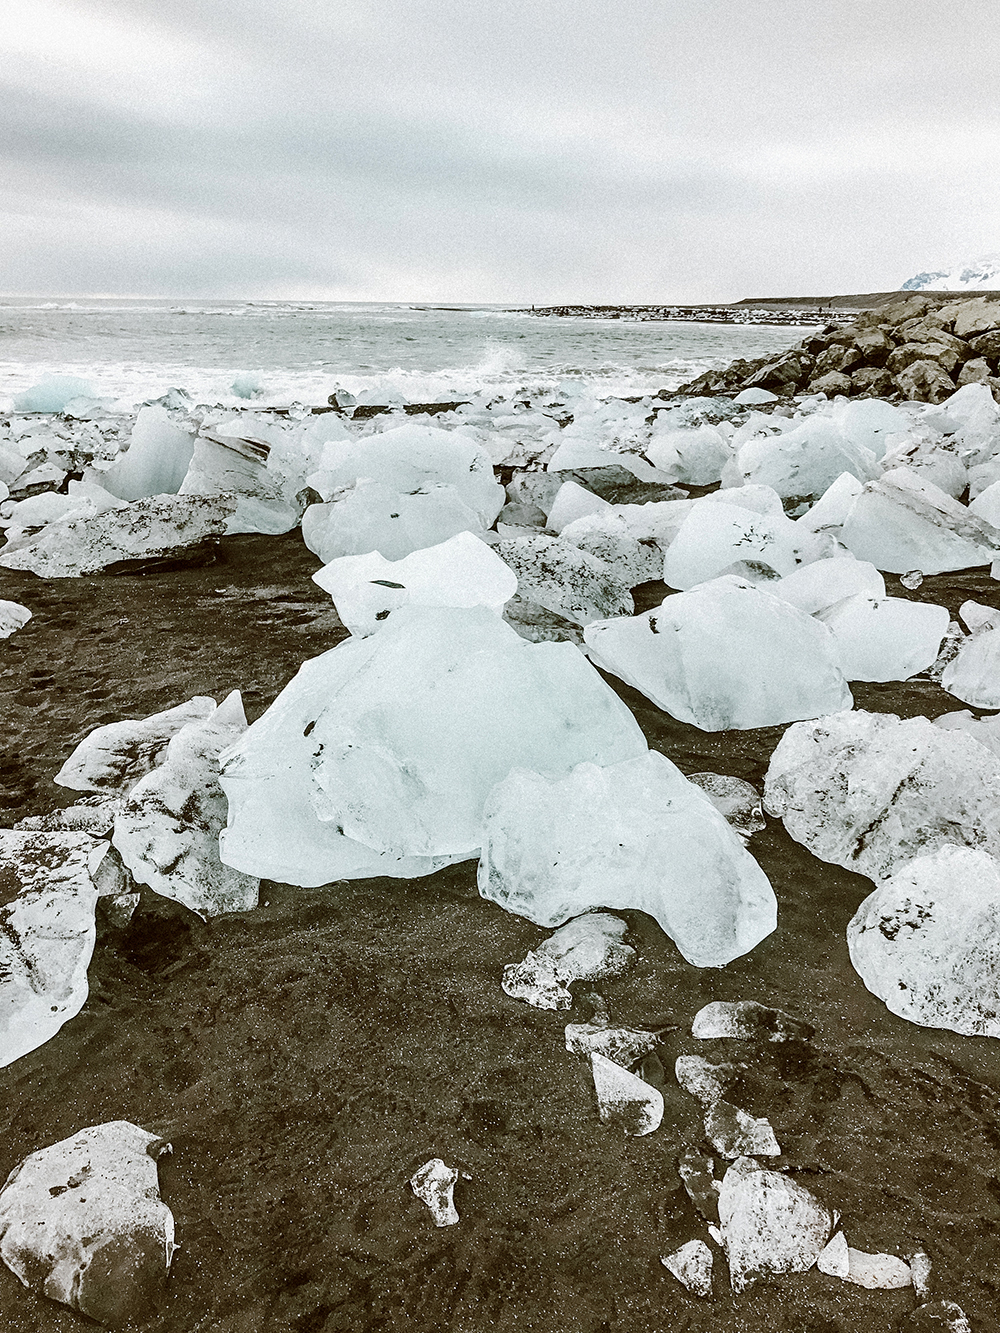 livvyland-blog-olivia-watson-travel-lifestyle-blogger-iceland-road-trip-what-to-do-pack-reykjavik-noken-travel-guide-diamond-beach